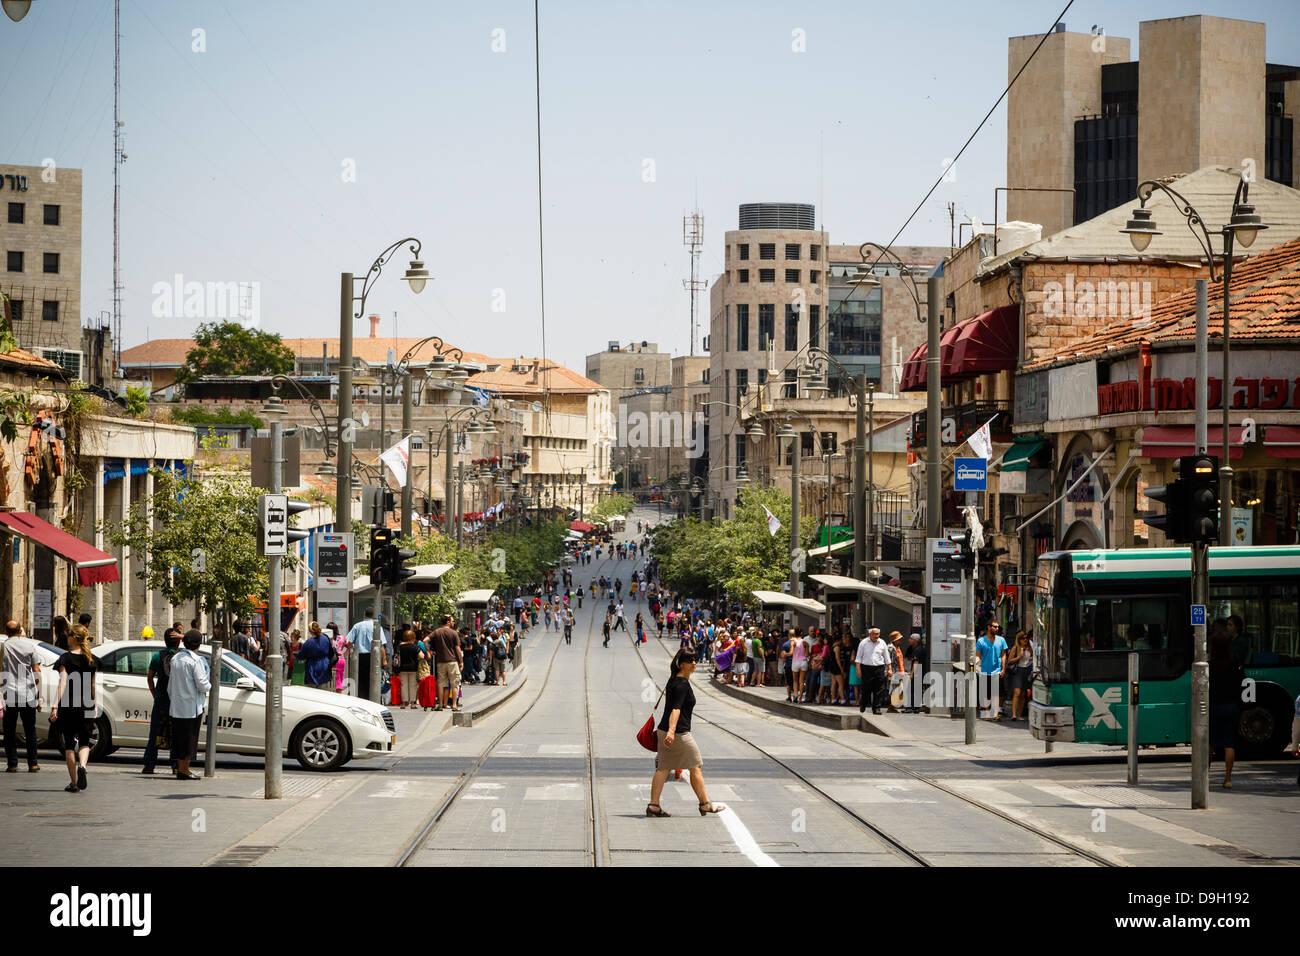 Jaffa street, Jerusalem, Israel. - Stock Image